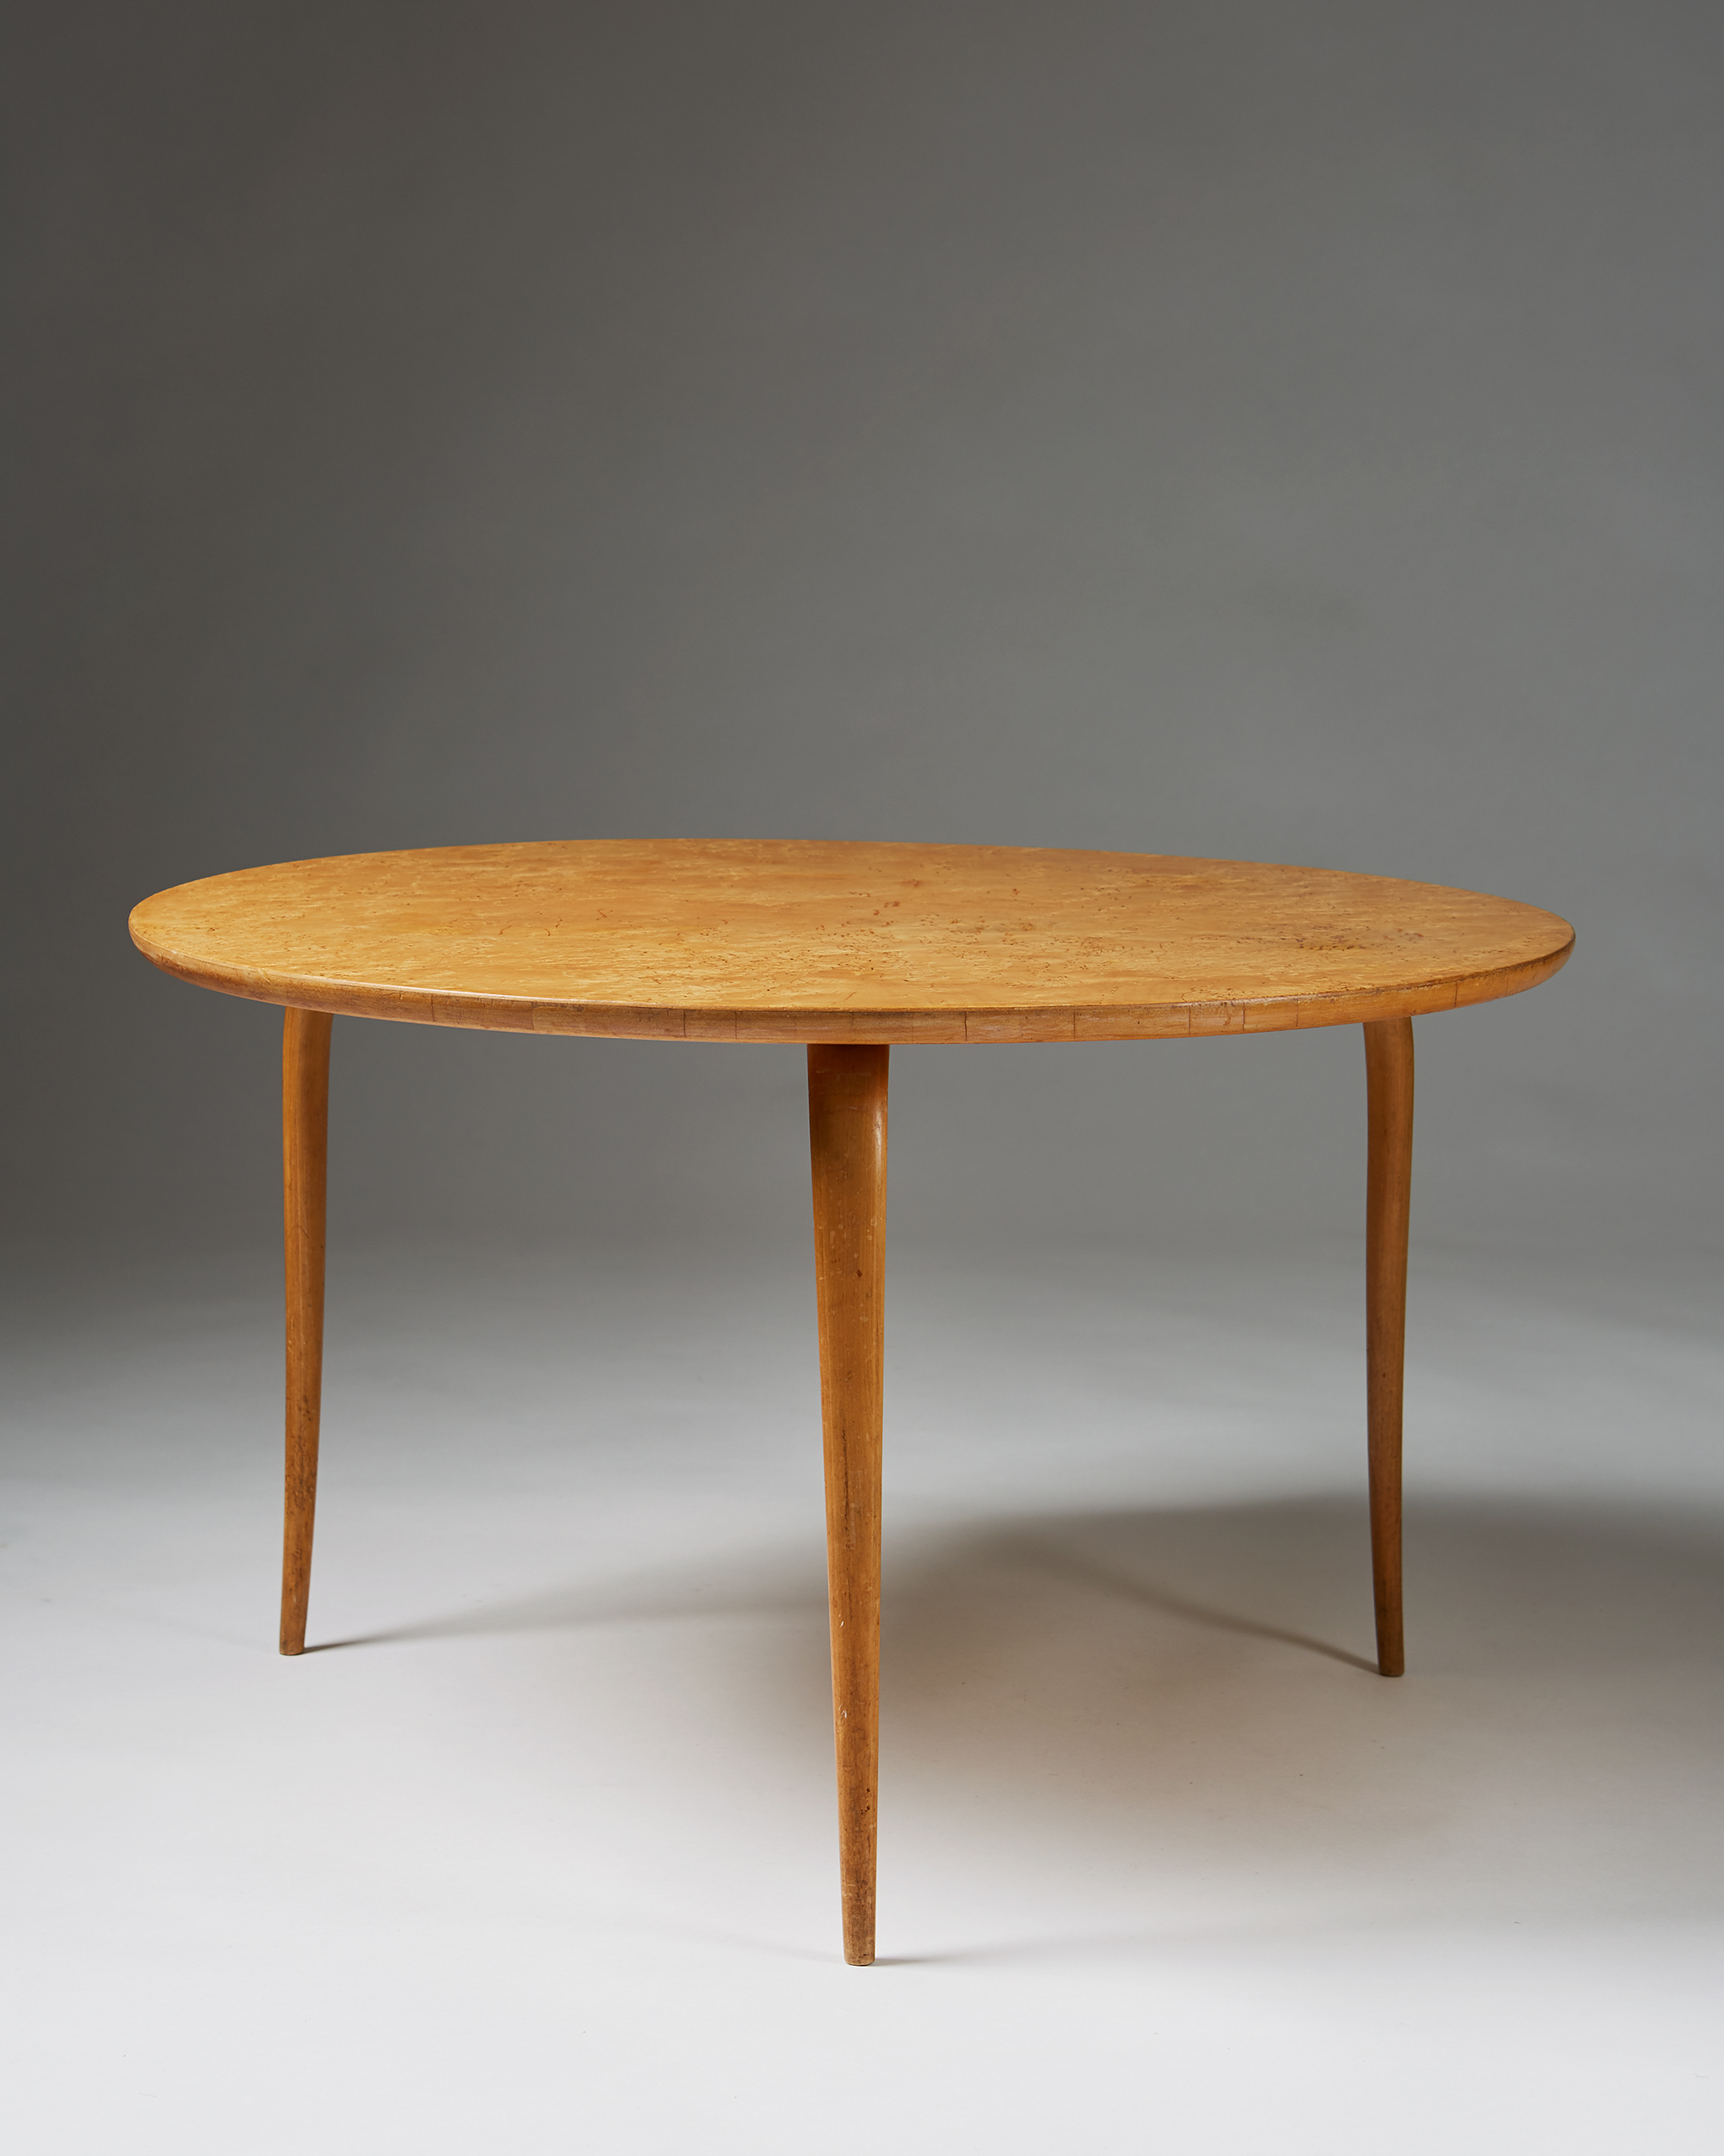 Bruno Mathsson   Annika, occasional table  Sweden, 1936 Birch and Karelian birch 51 x 85 cm